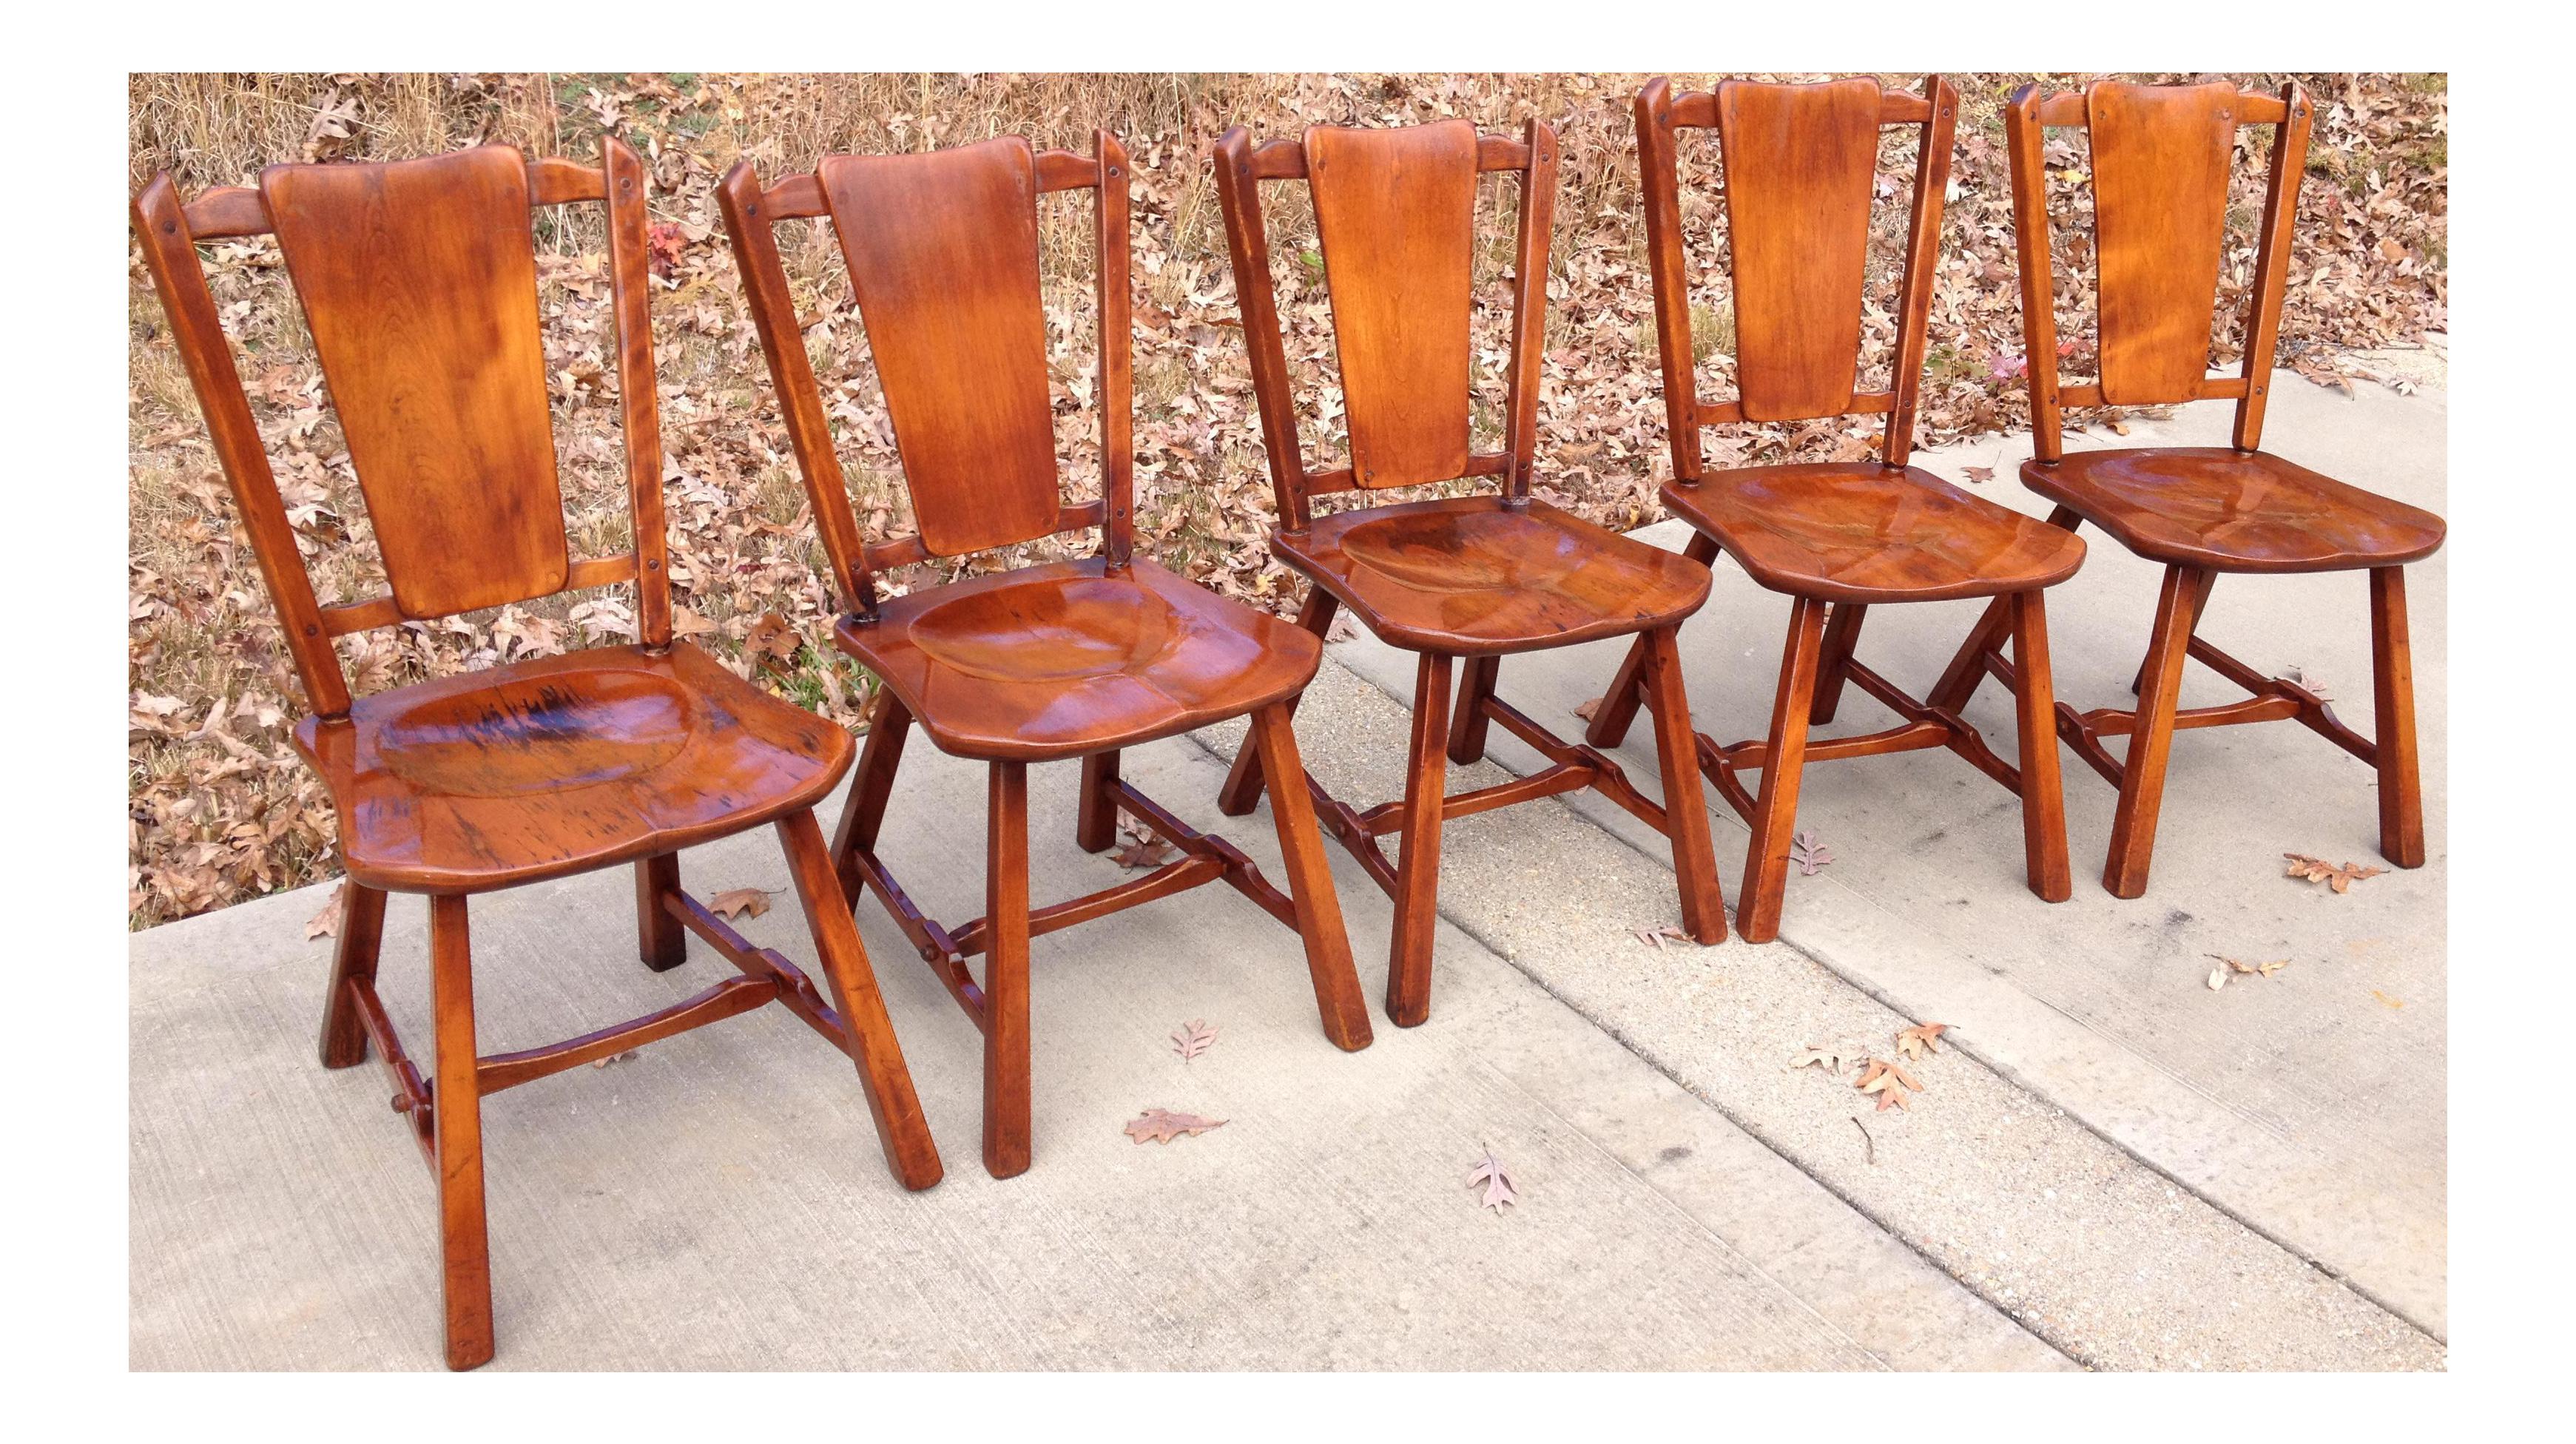 Heywood Wakefield Priscilla Flat Bone Back Chairs Set of 5